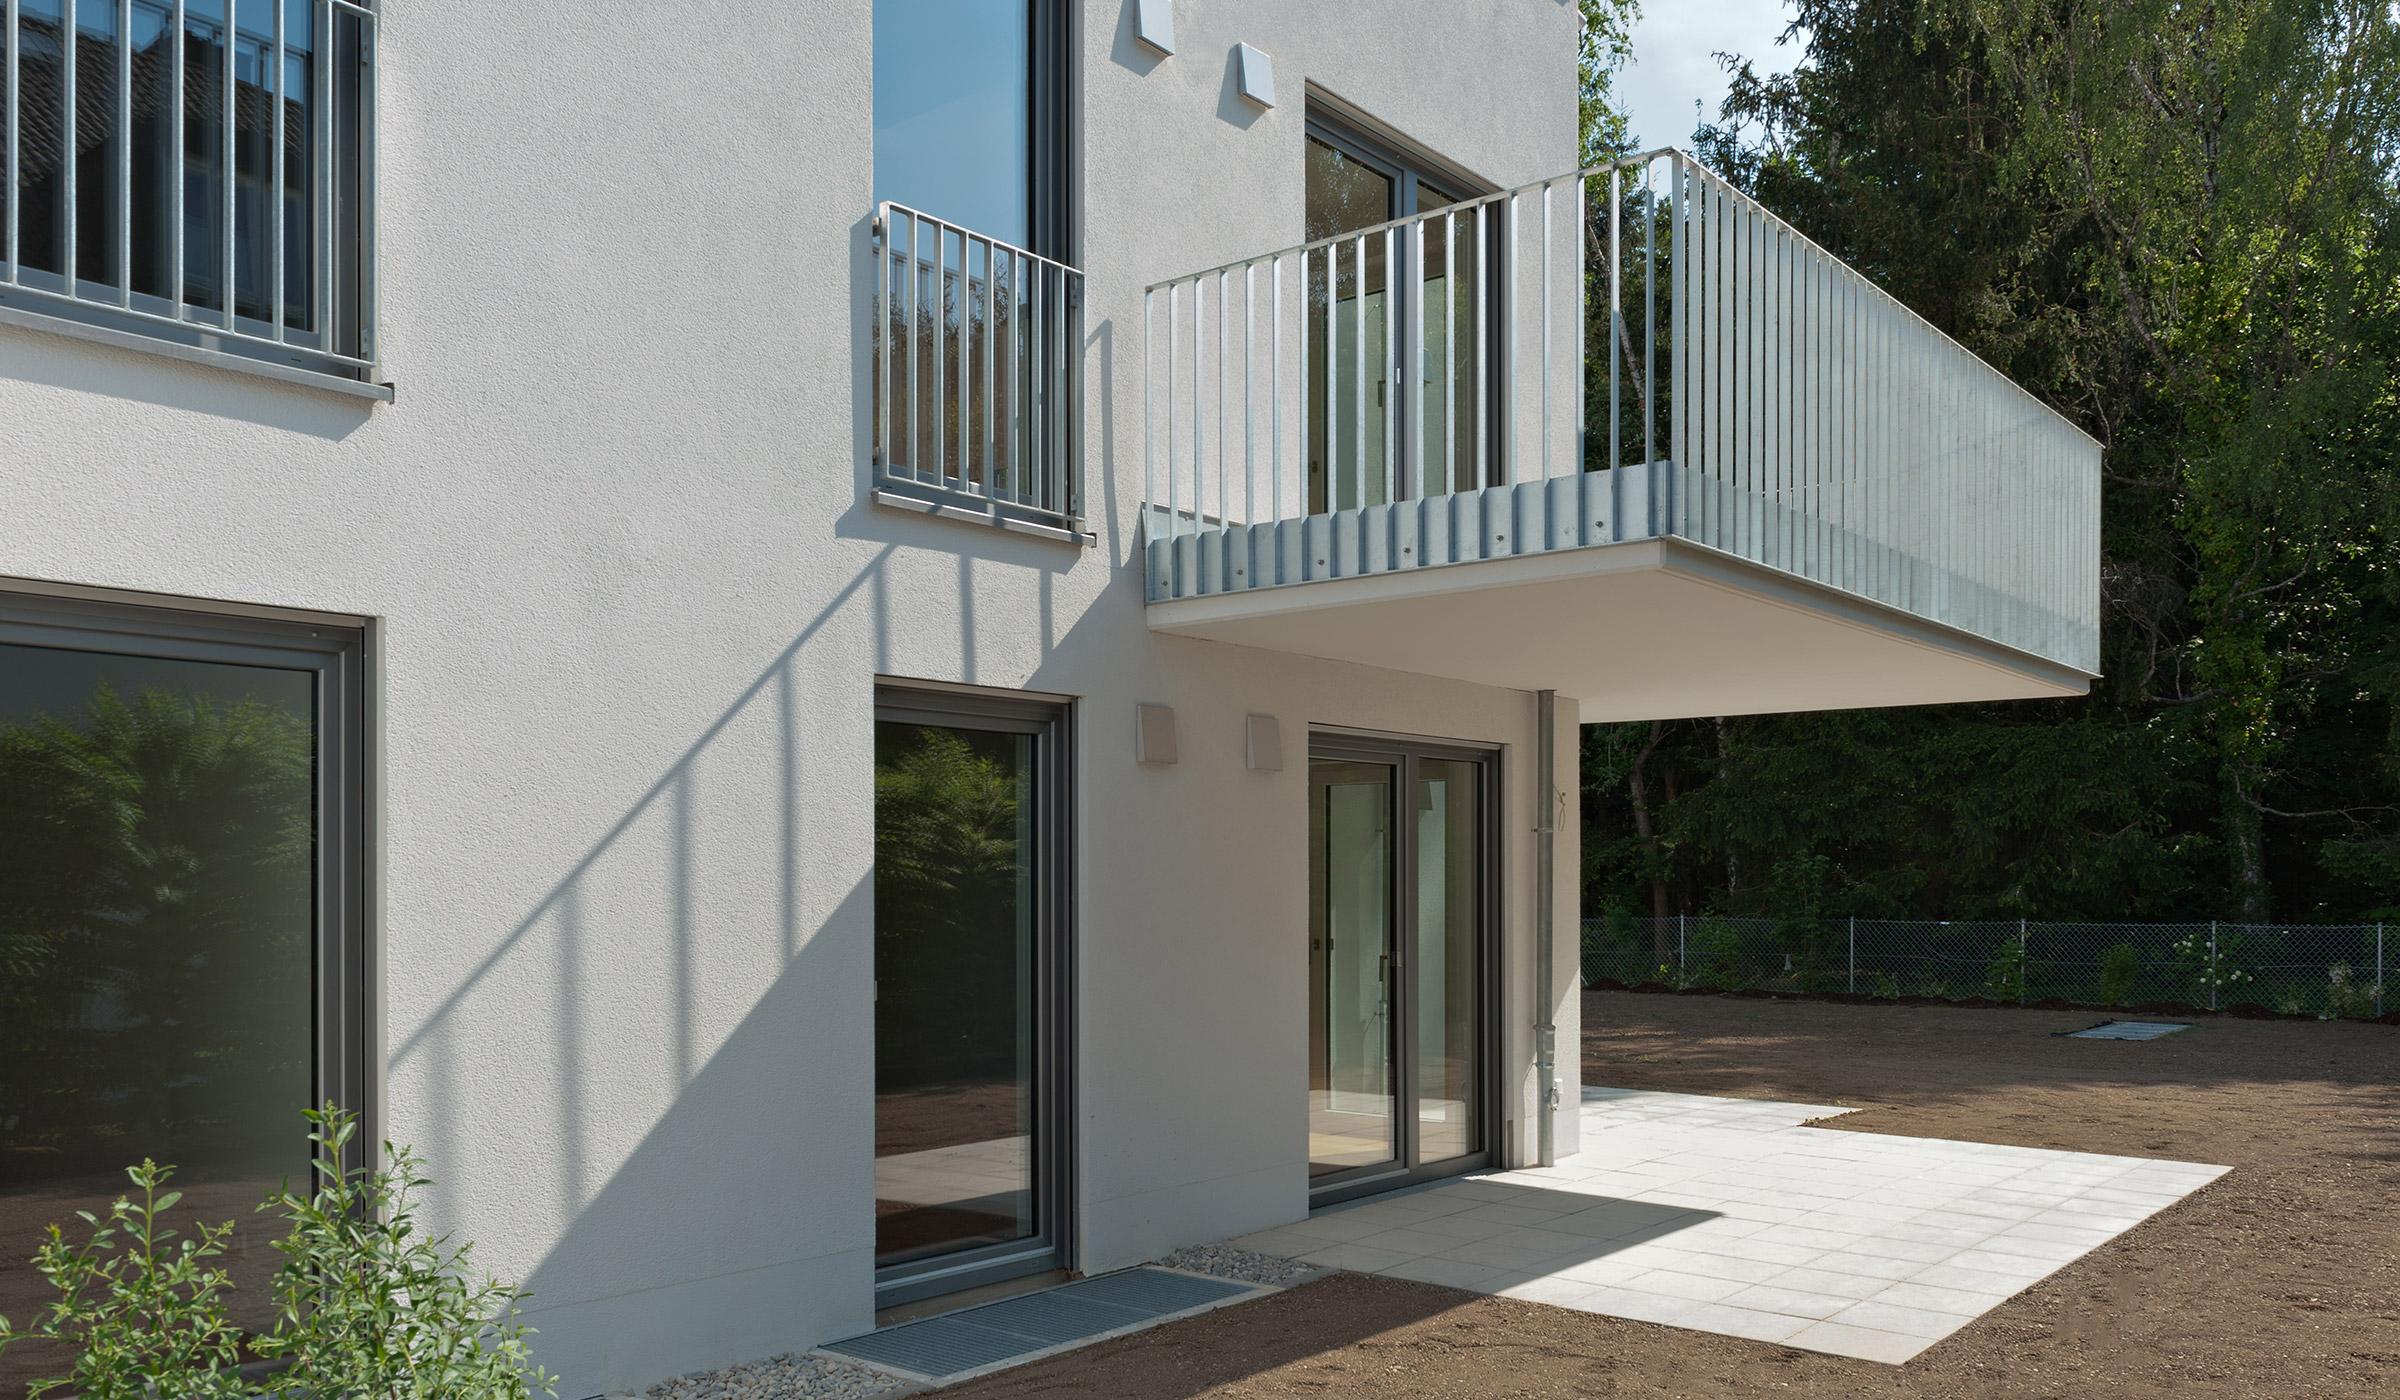 3BAU-Referenz-Heimdall-Neubau-Mehrfamilienhaus-Waldperlach-3